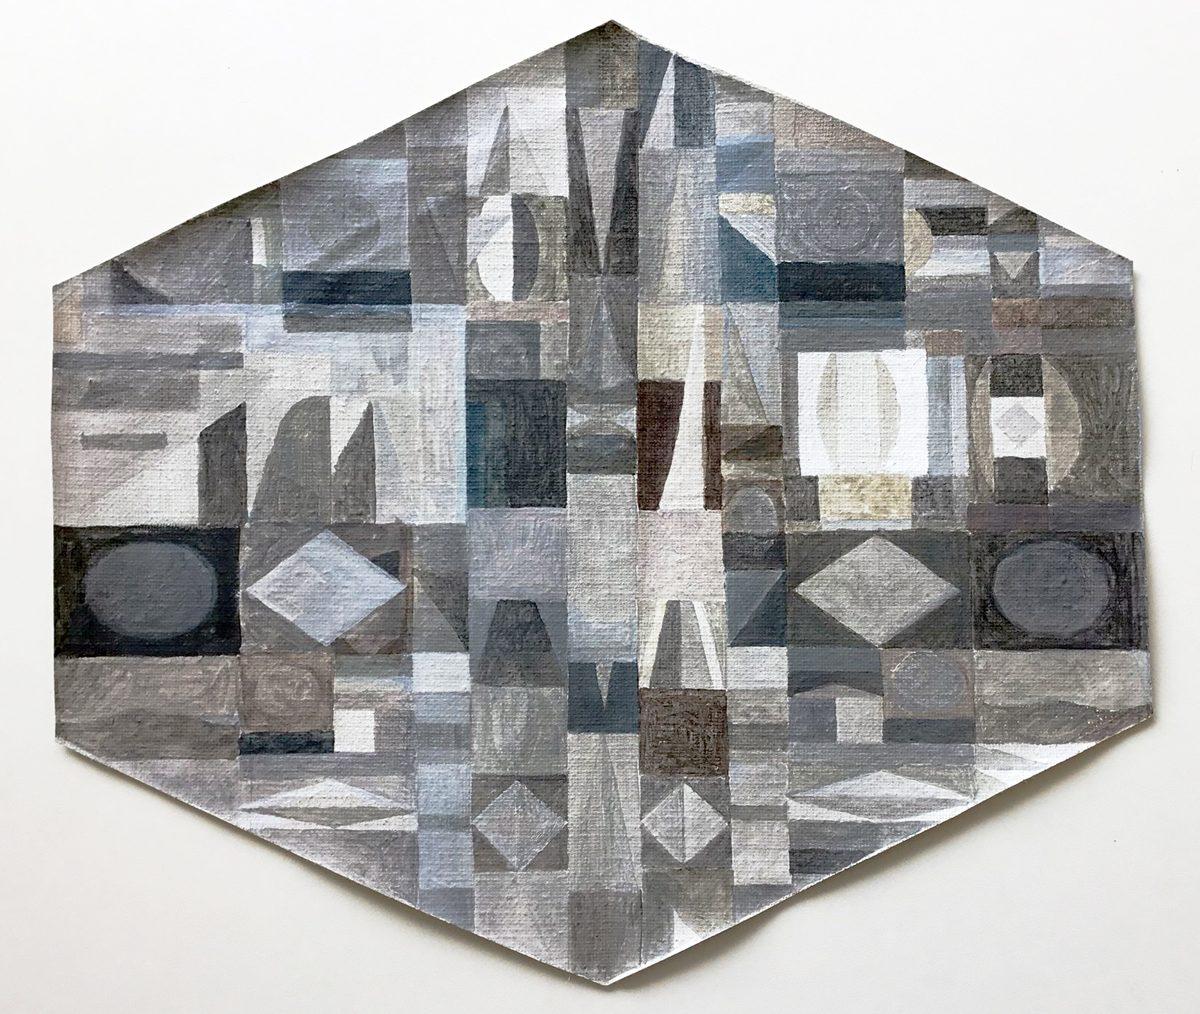 Carl Johan Sennels | Ruminations, 2017. Oil, acrylic, watercolor on canvas, 31x35 cm